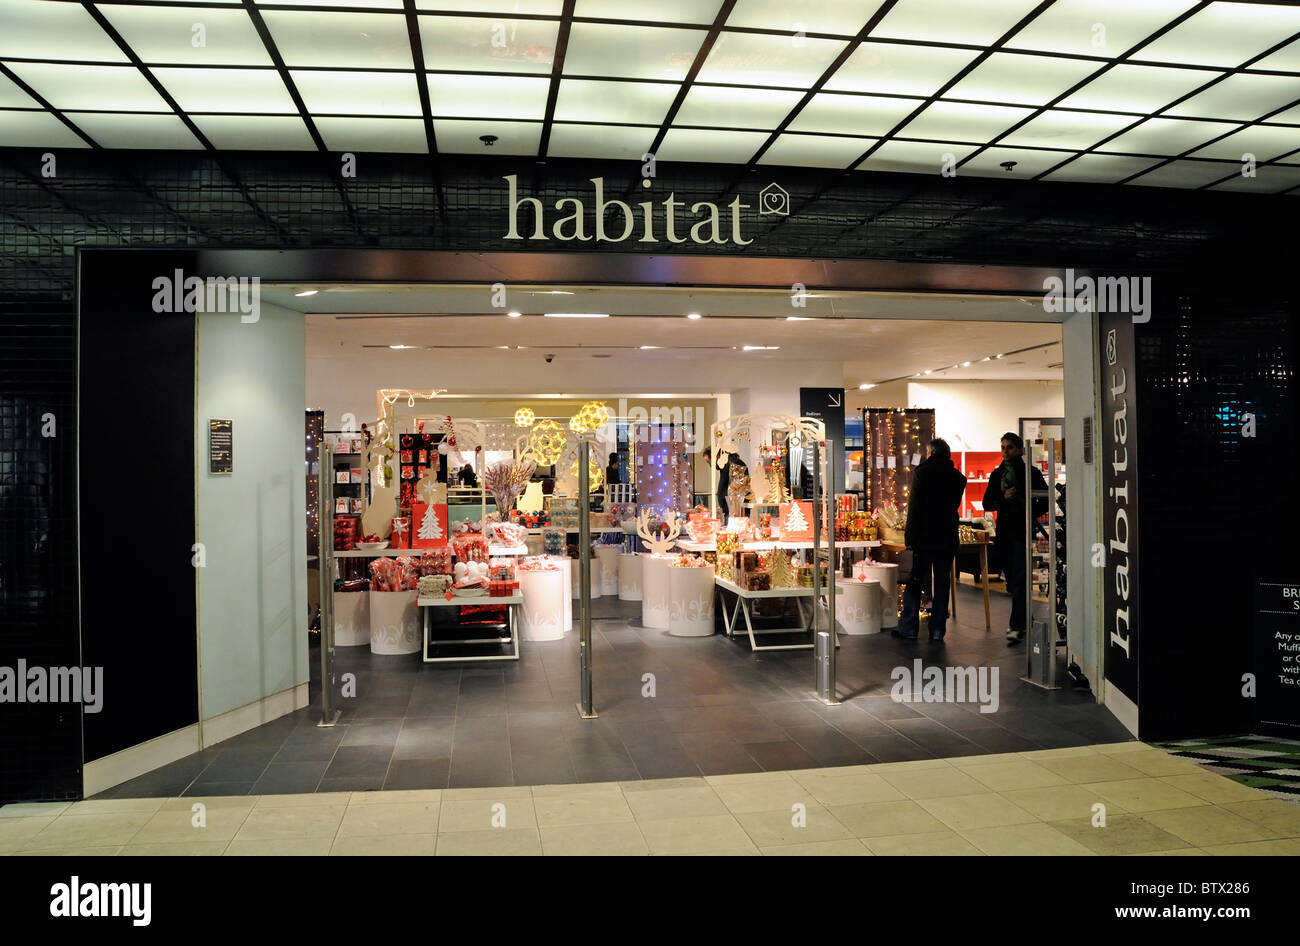 Habitat Düsseldorf habitat store stock photos habitat store stock images alamy